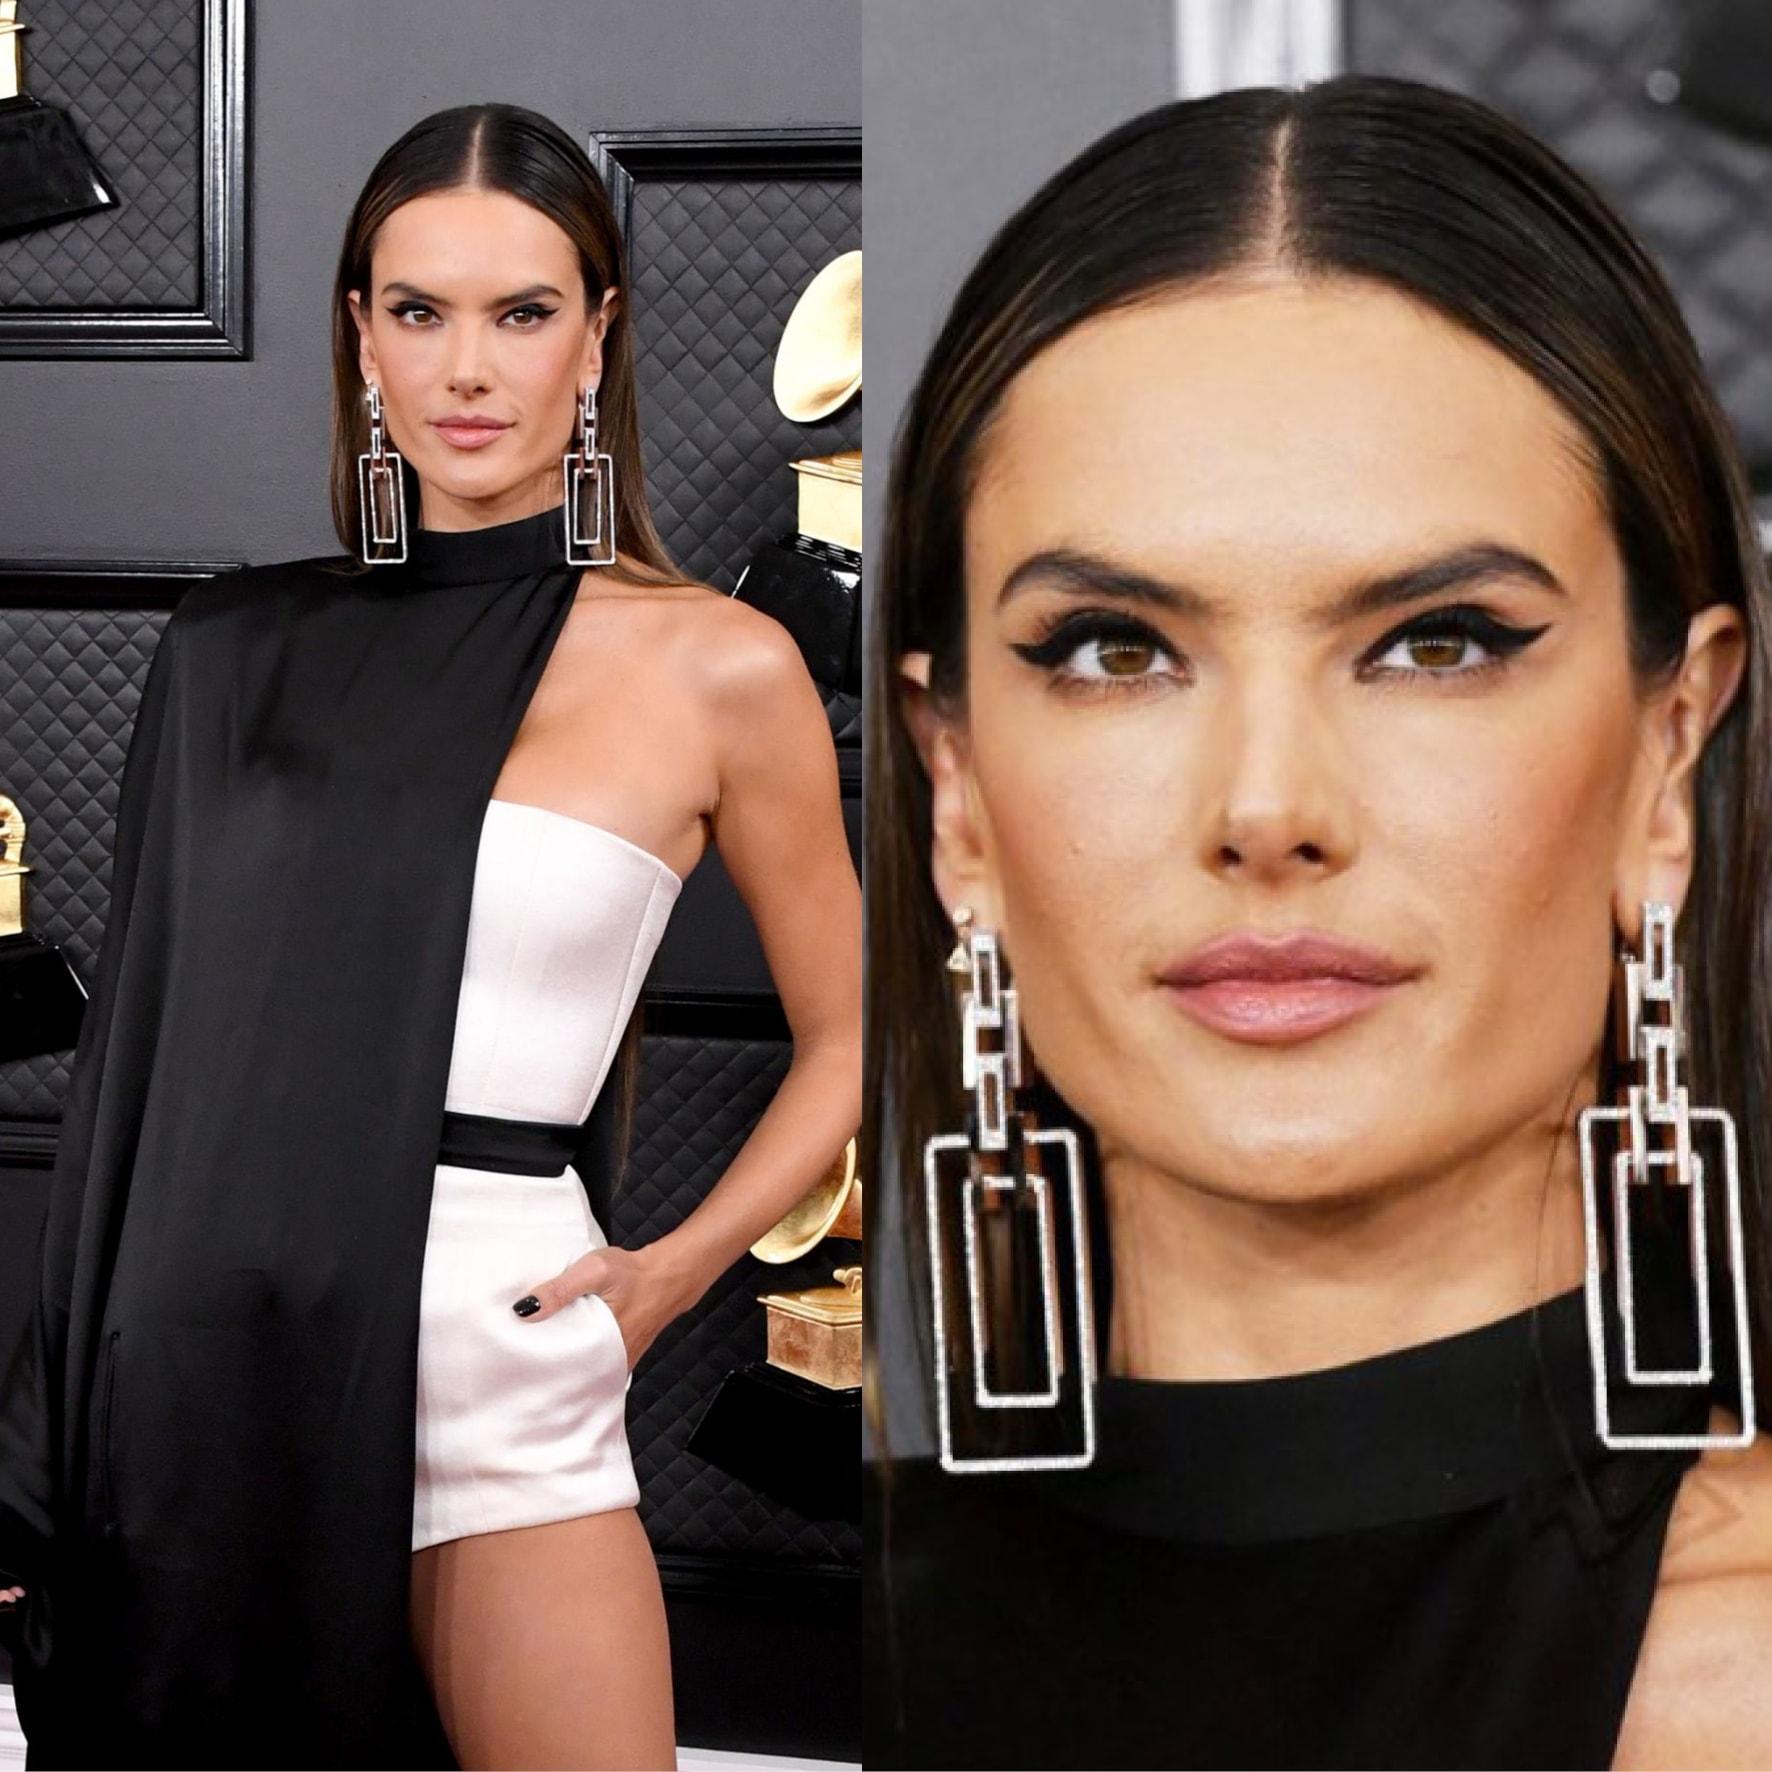 lessandra Ambrosio's big sized geometric earrings from Marli New York